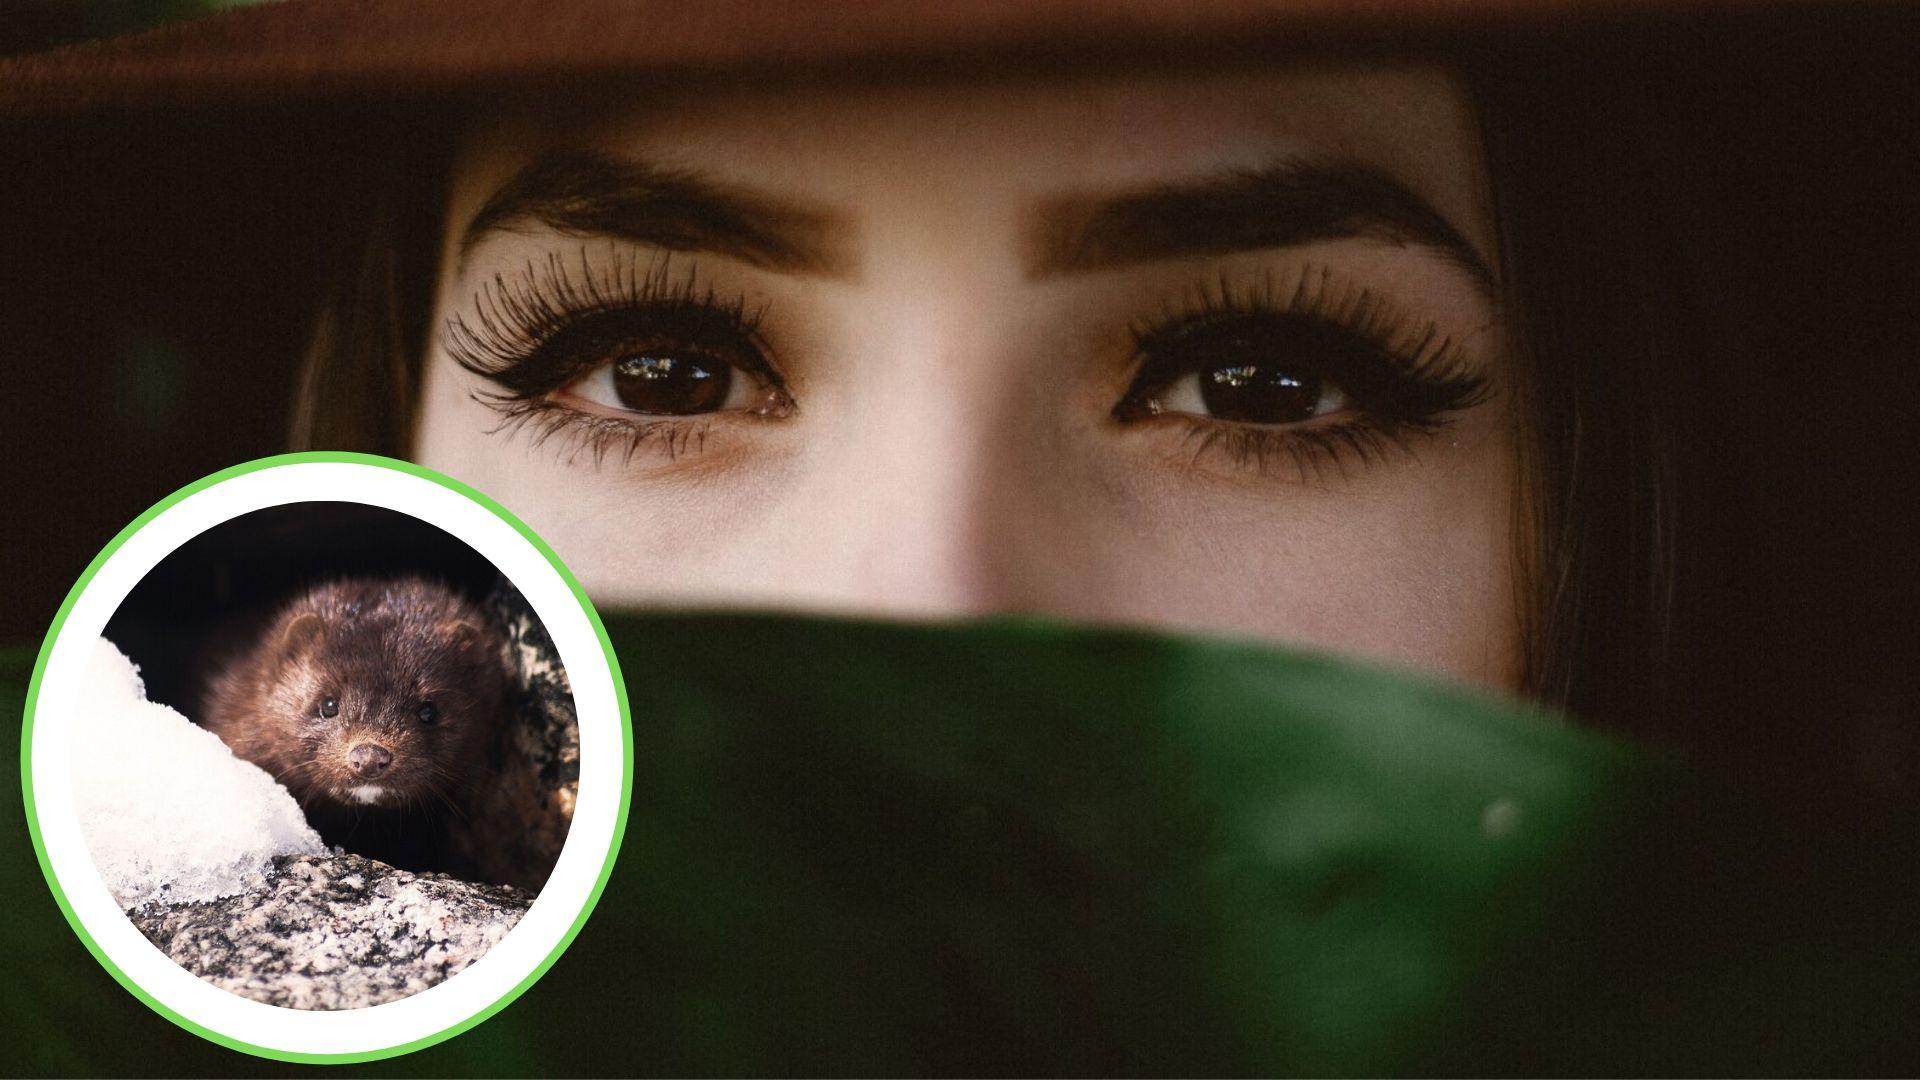 Victory! Velour Bans Mink-Fur Eyelashes After PETA Push